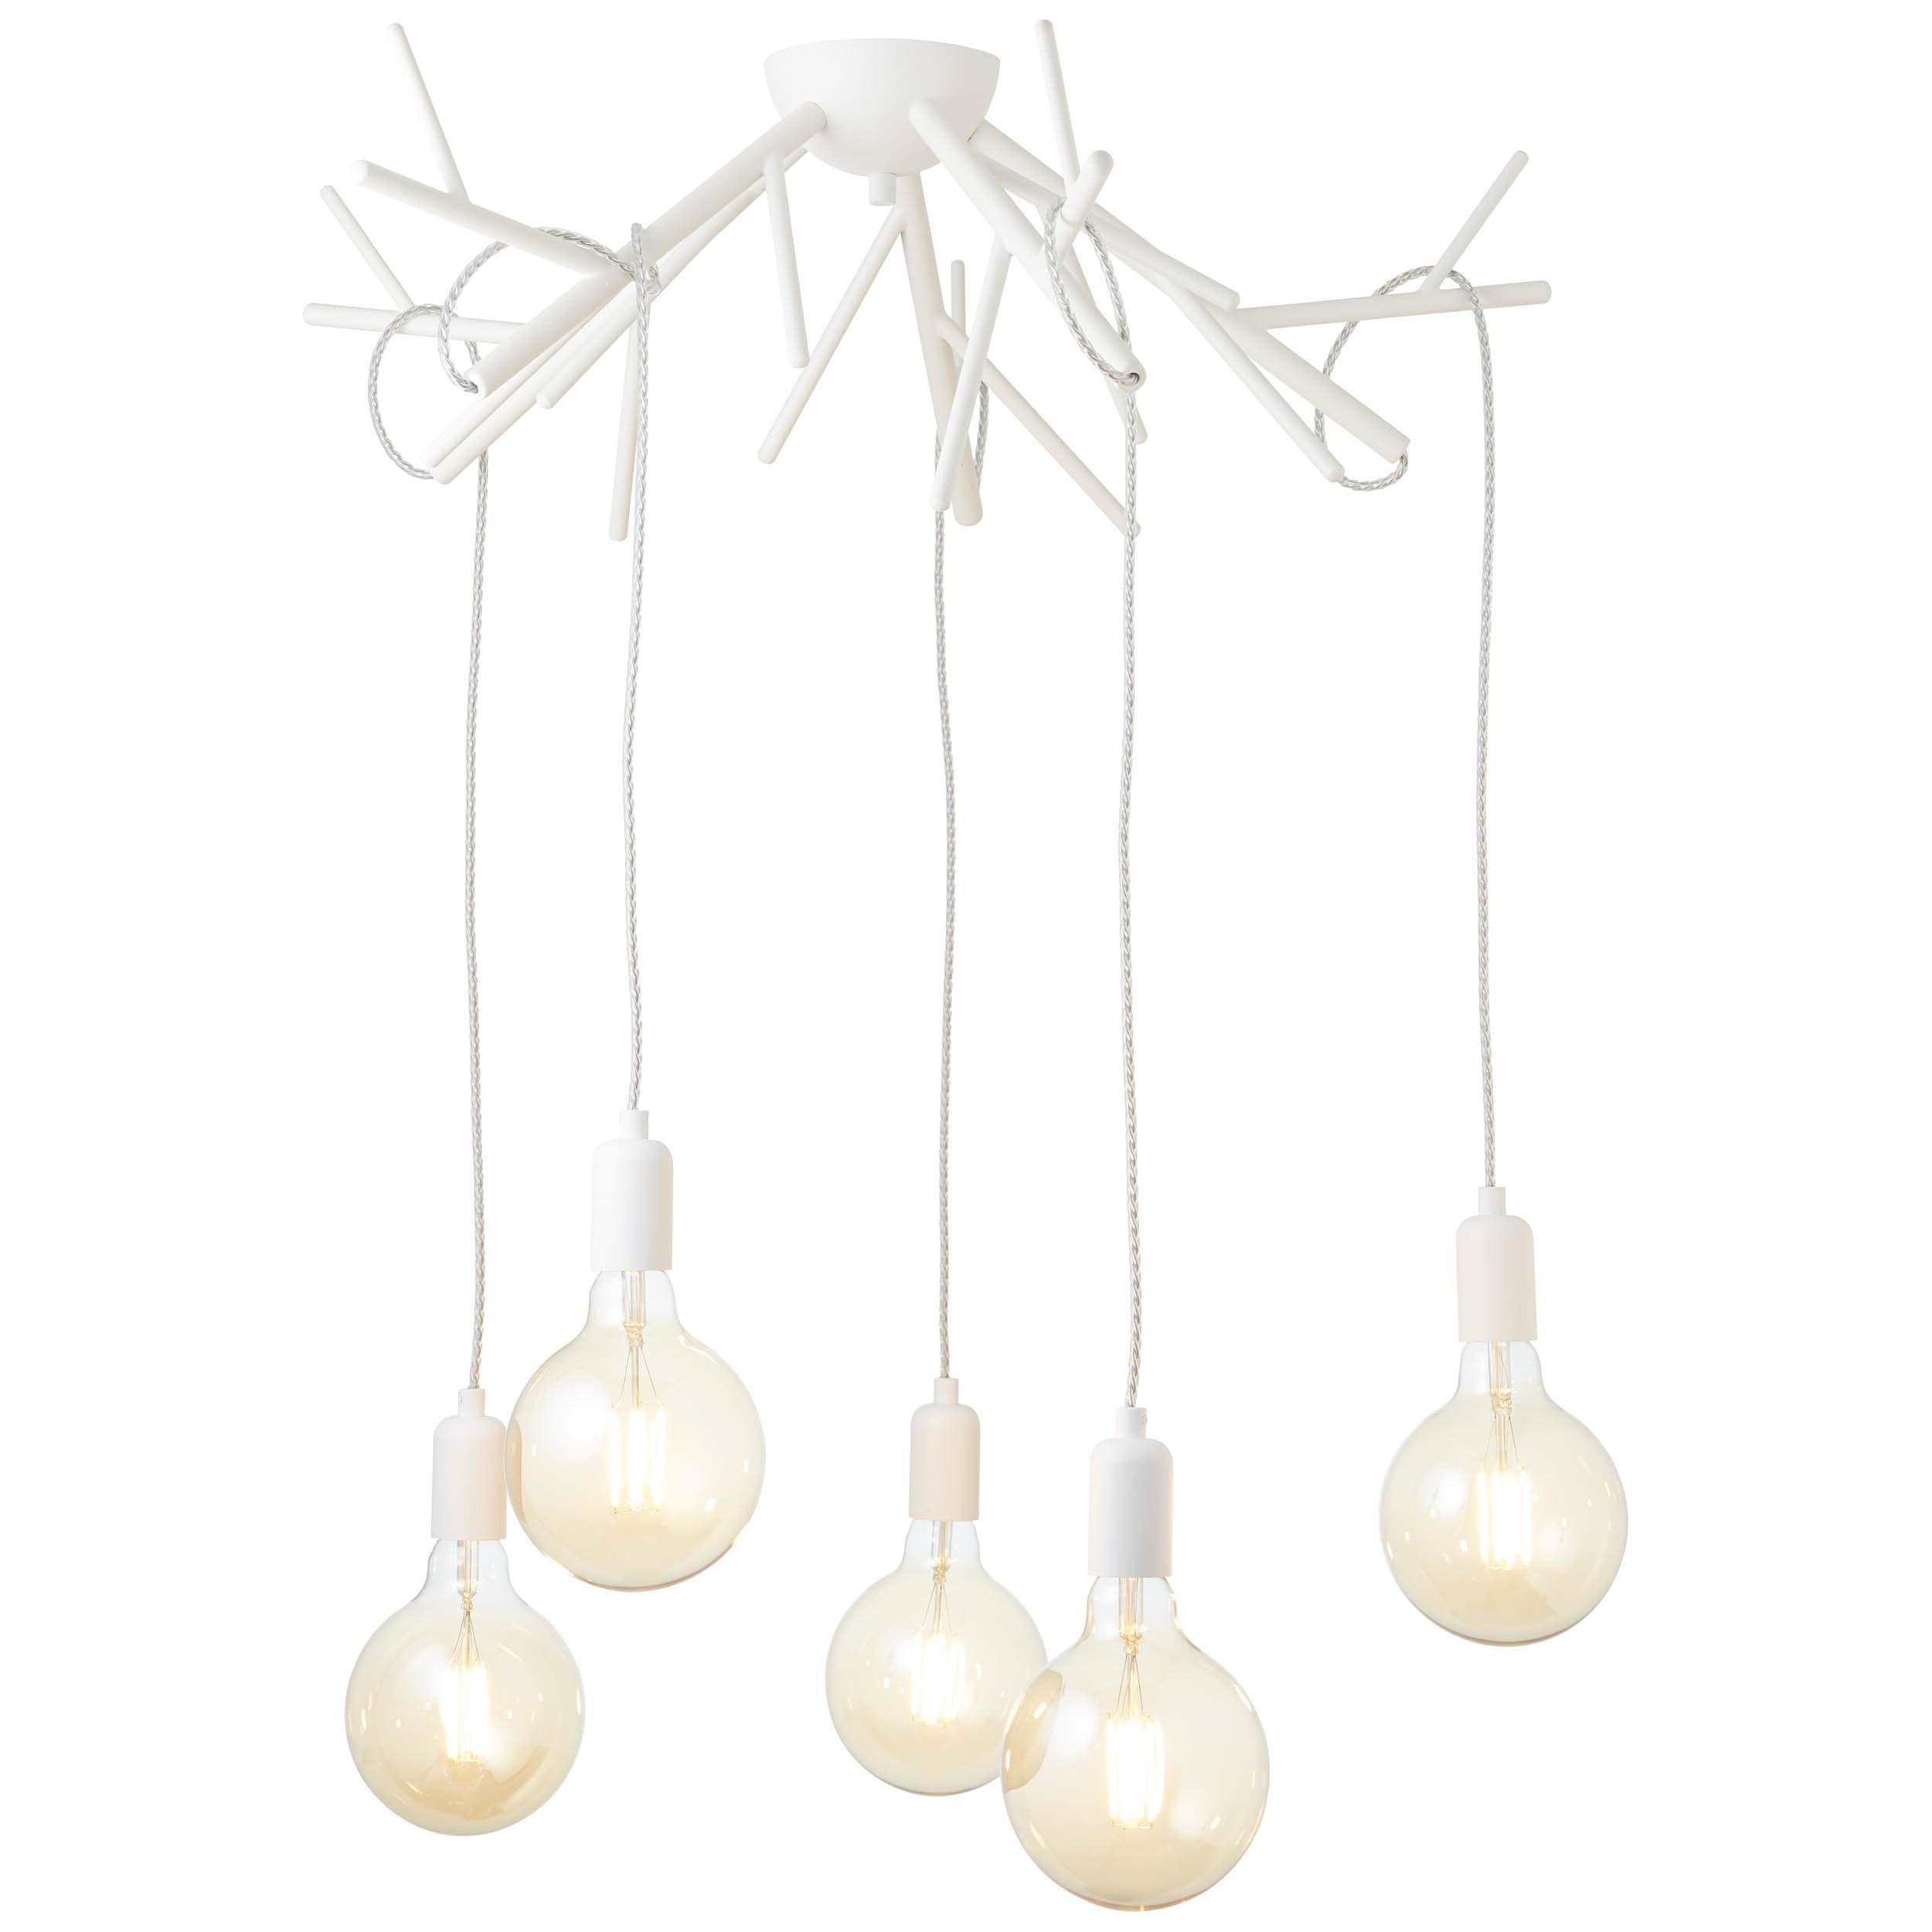 Brilliant Leuchten Faun LED Pendelleuchte 5flg weiÃY matt